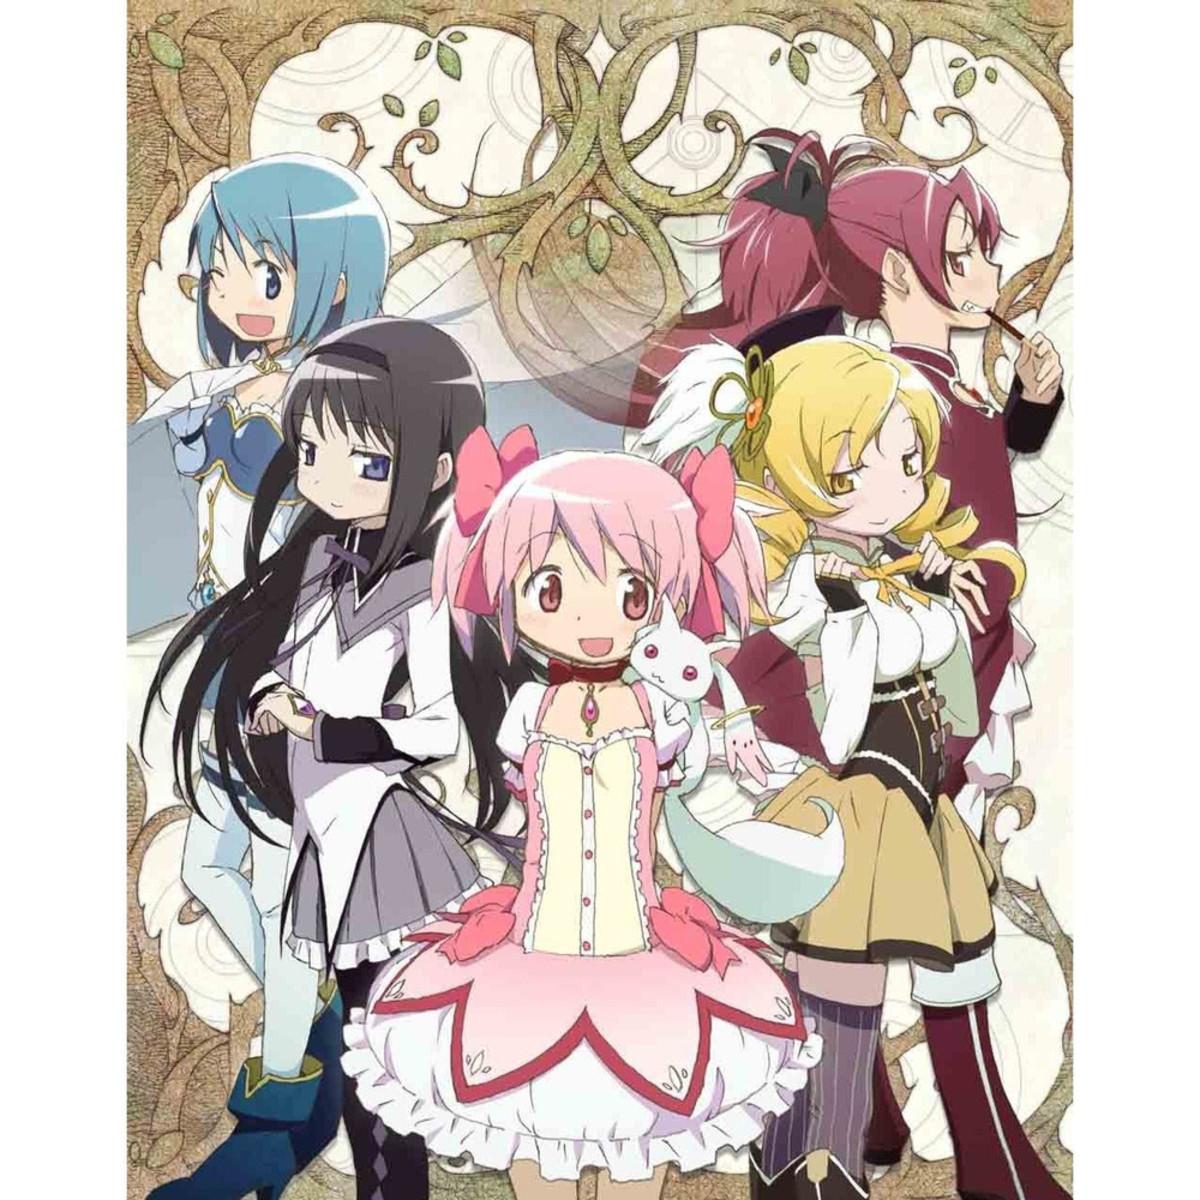 Anime Review: Puella Magi Madoka Magica (2011)